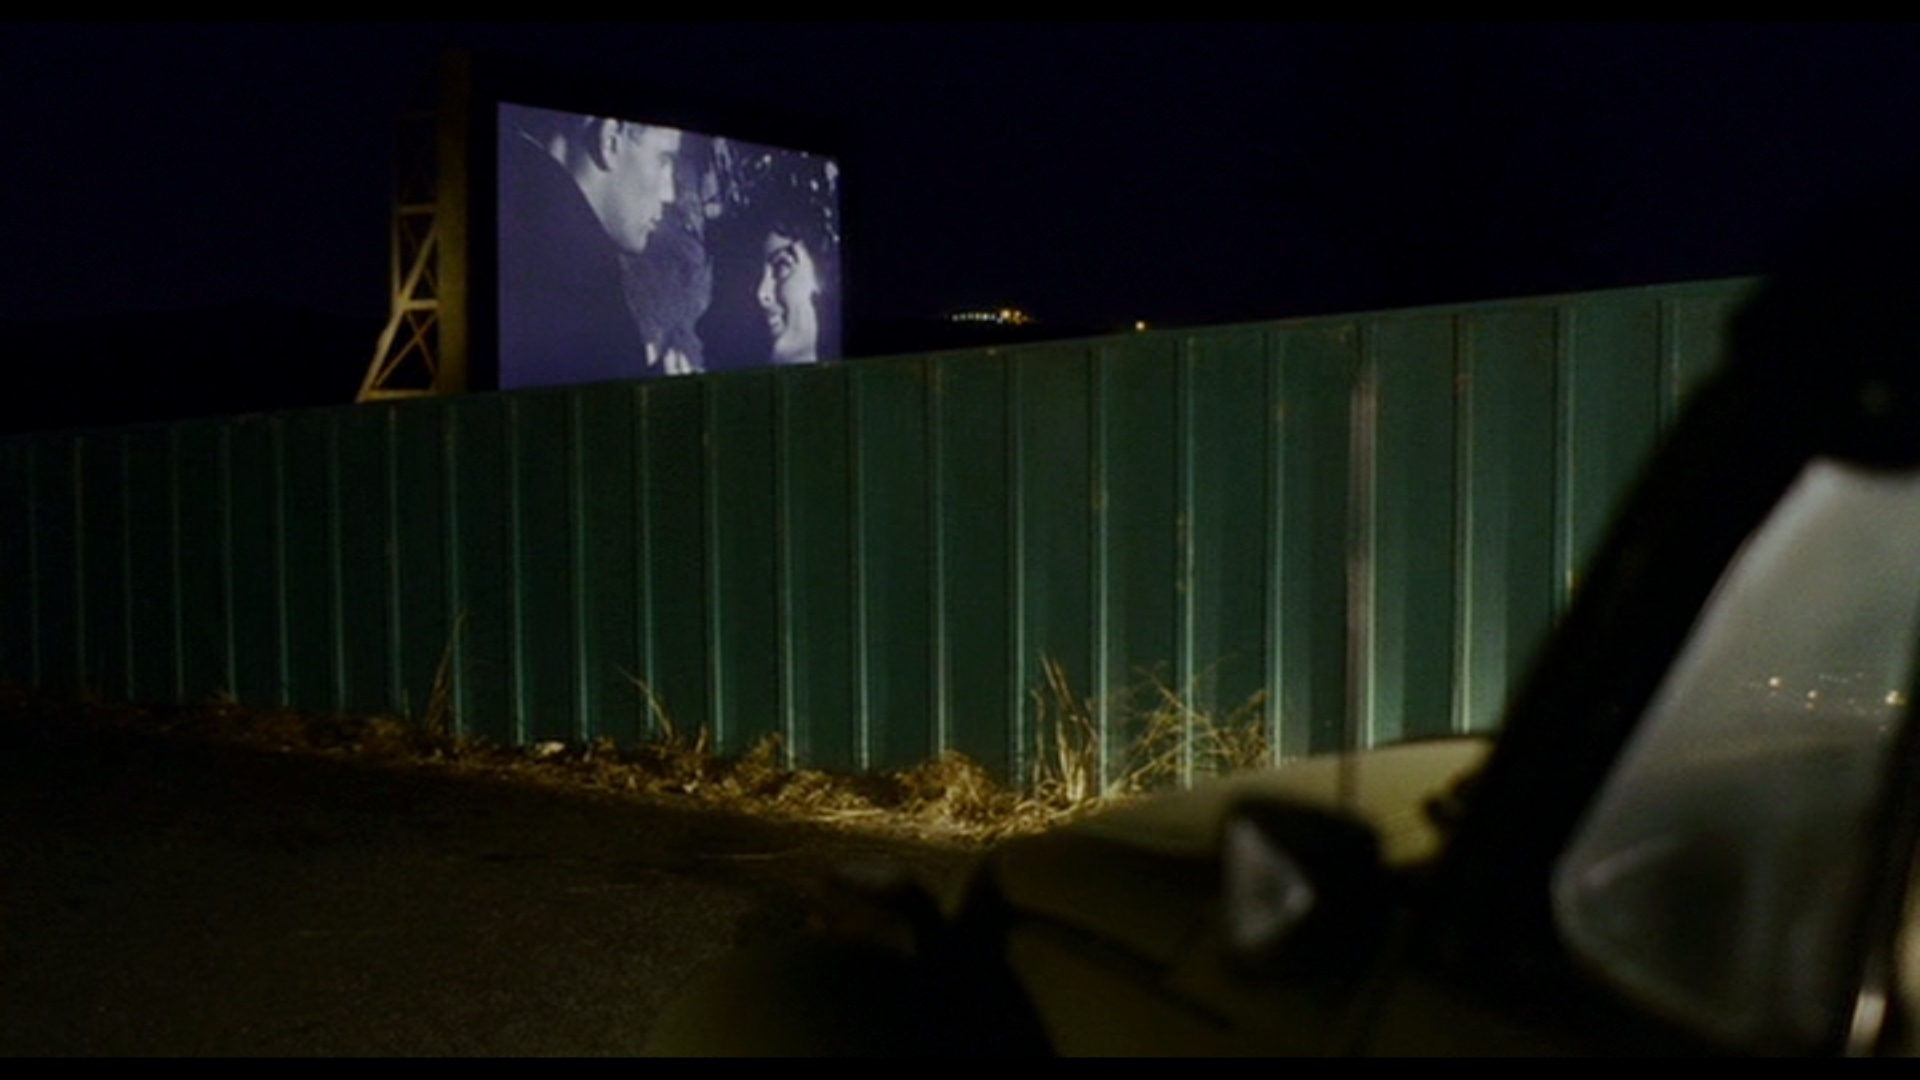 Eternal Sunshine of the Spotless Mind film still